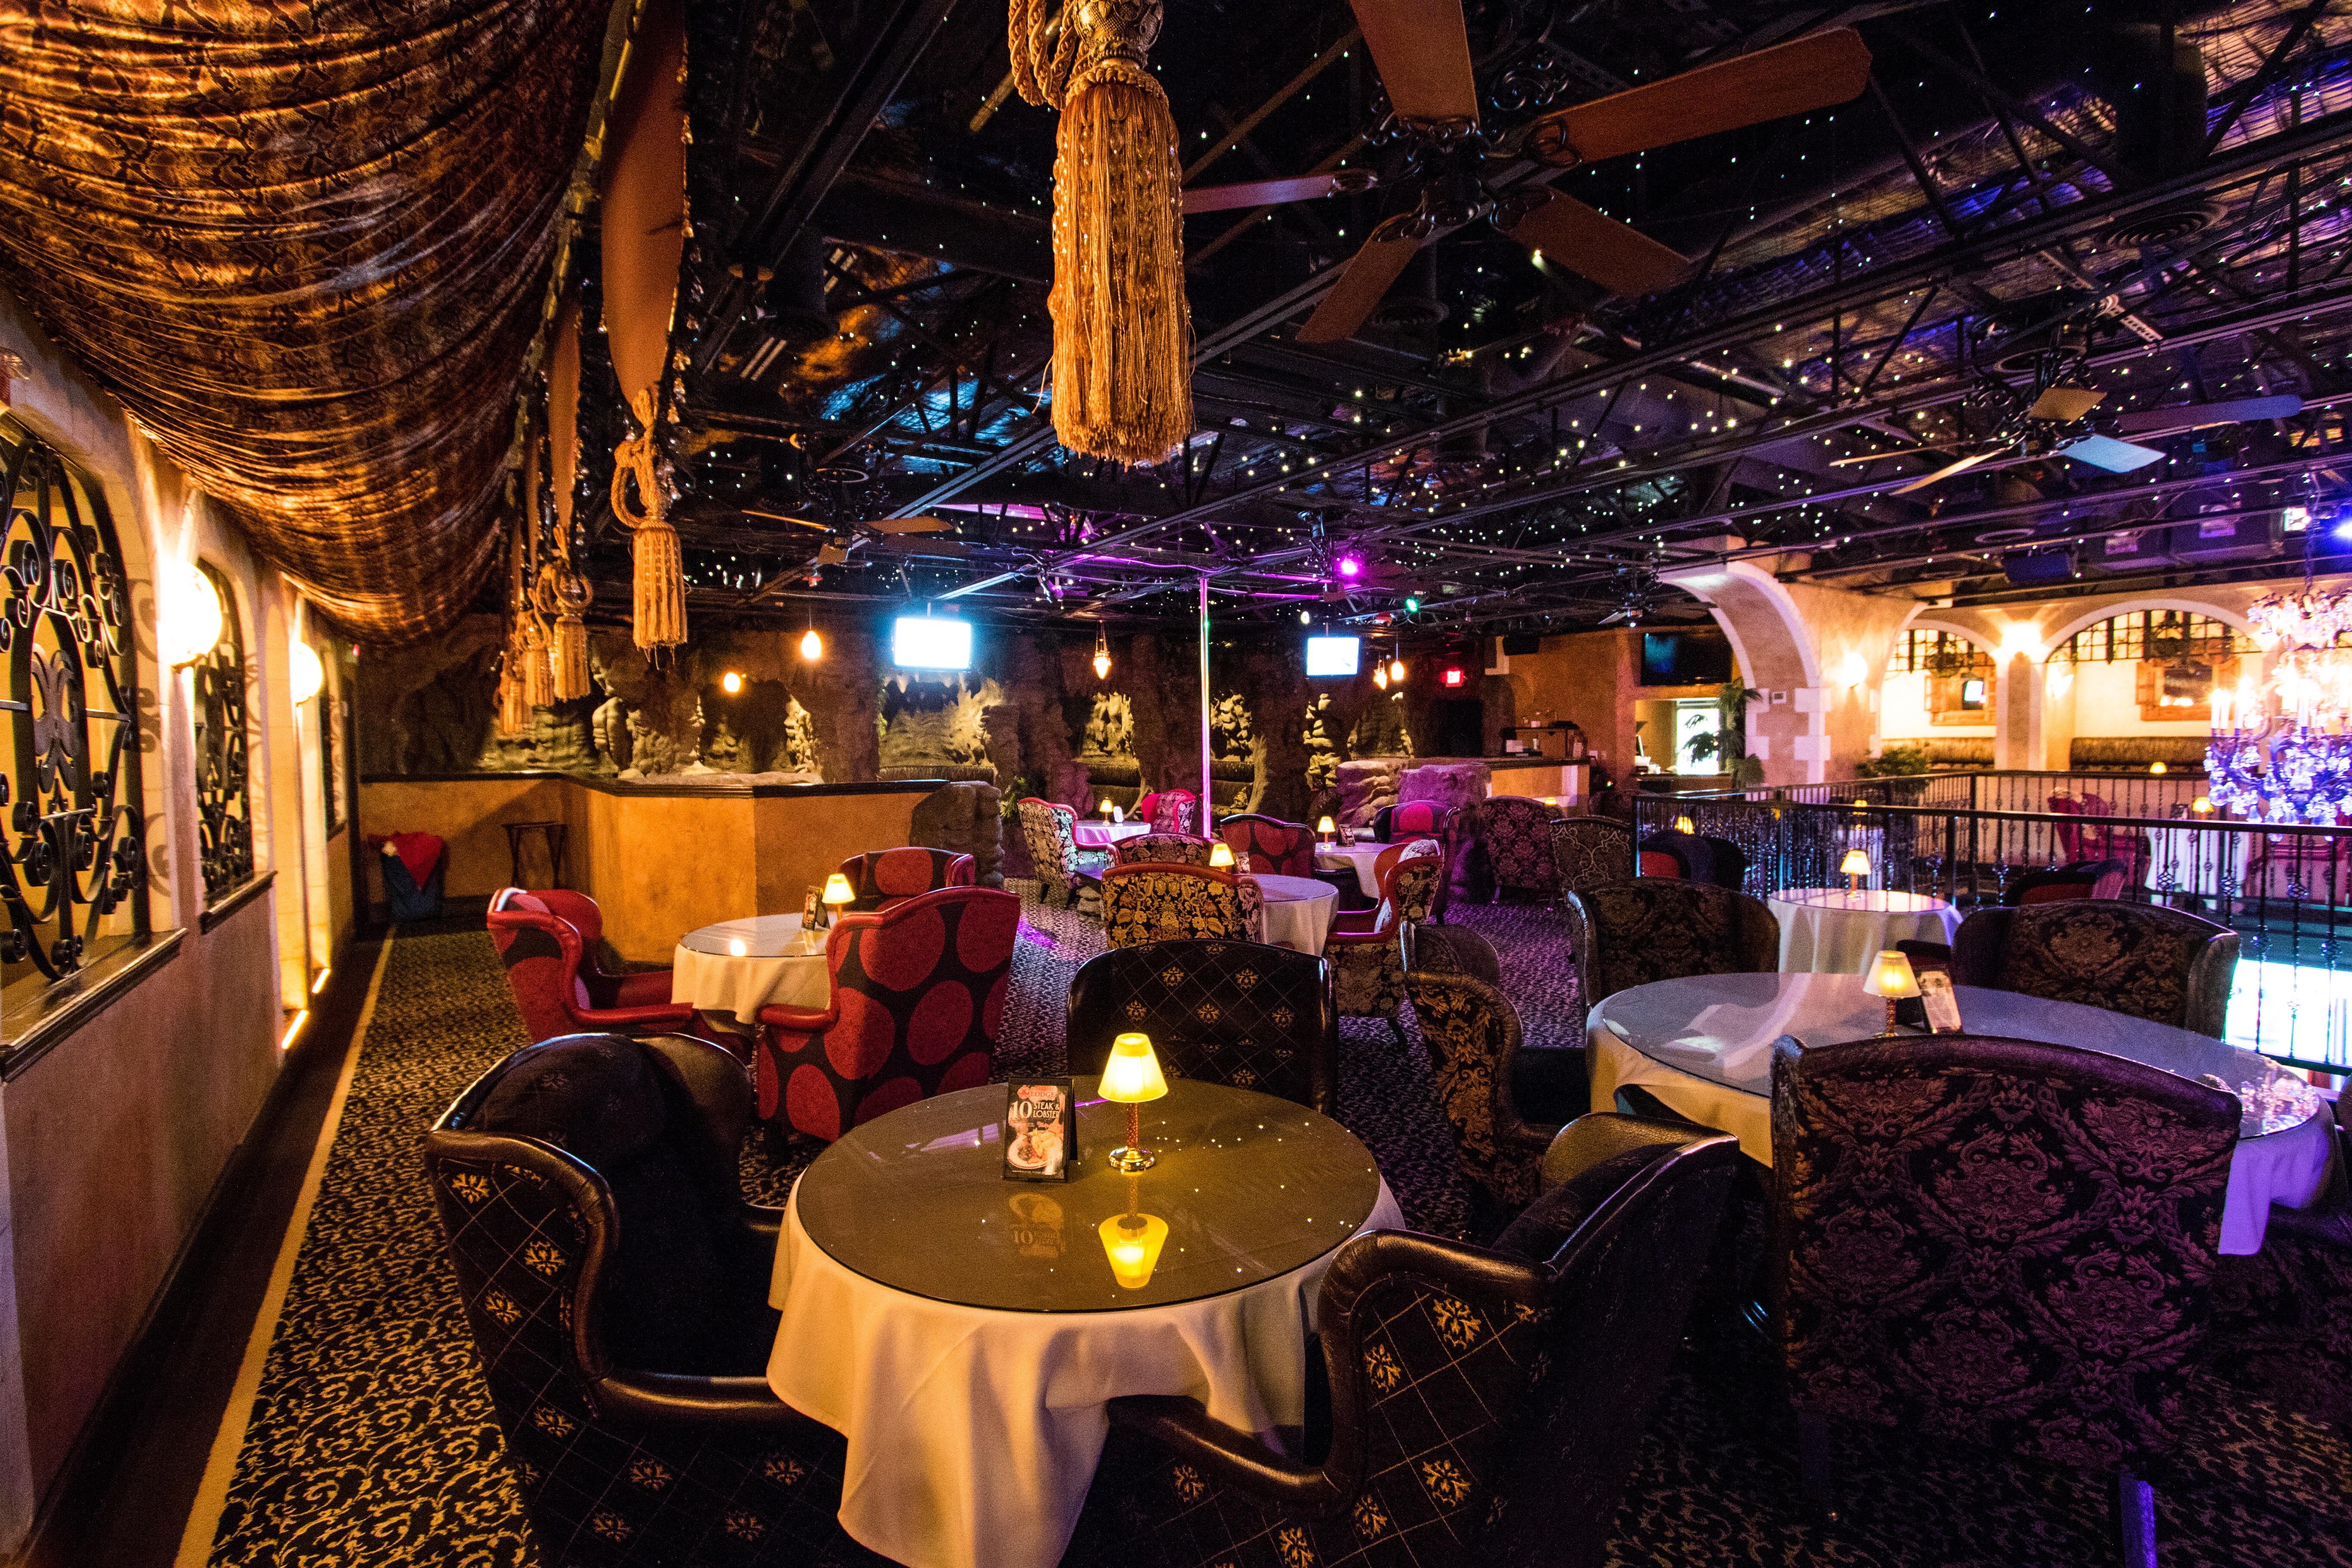 The Lodge VIP Lounge